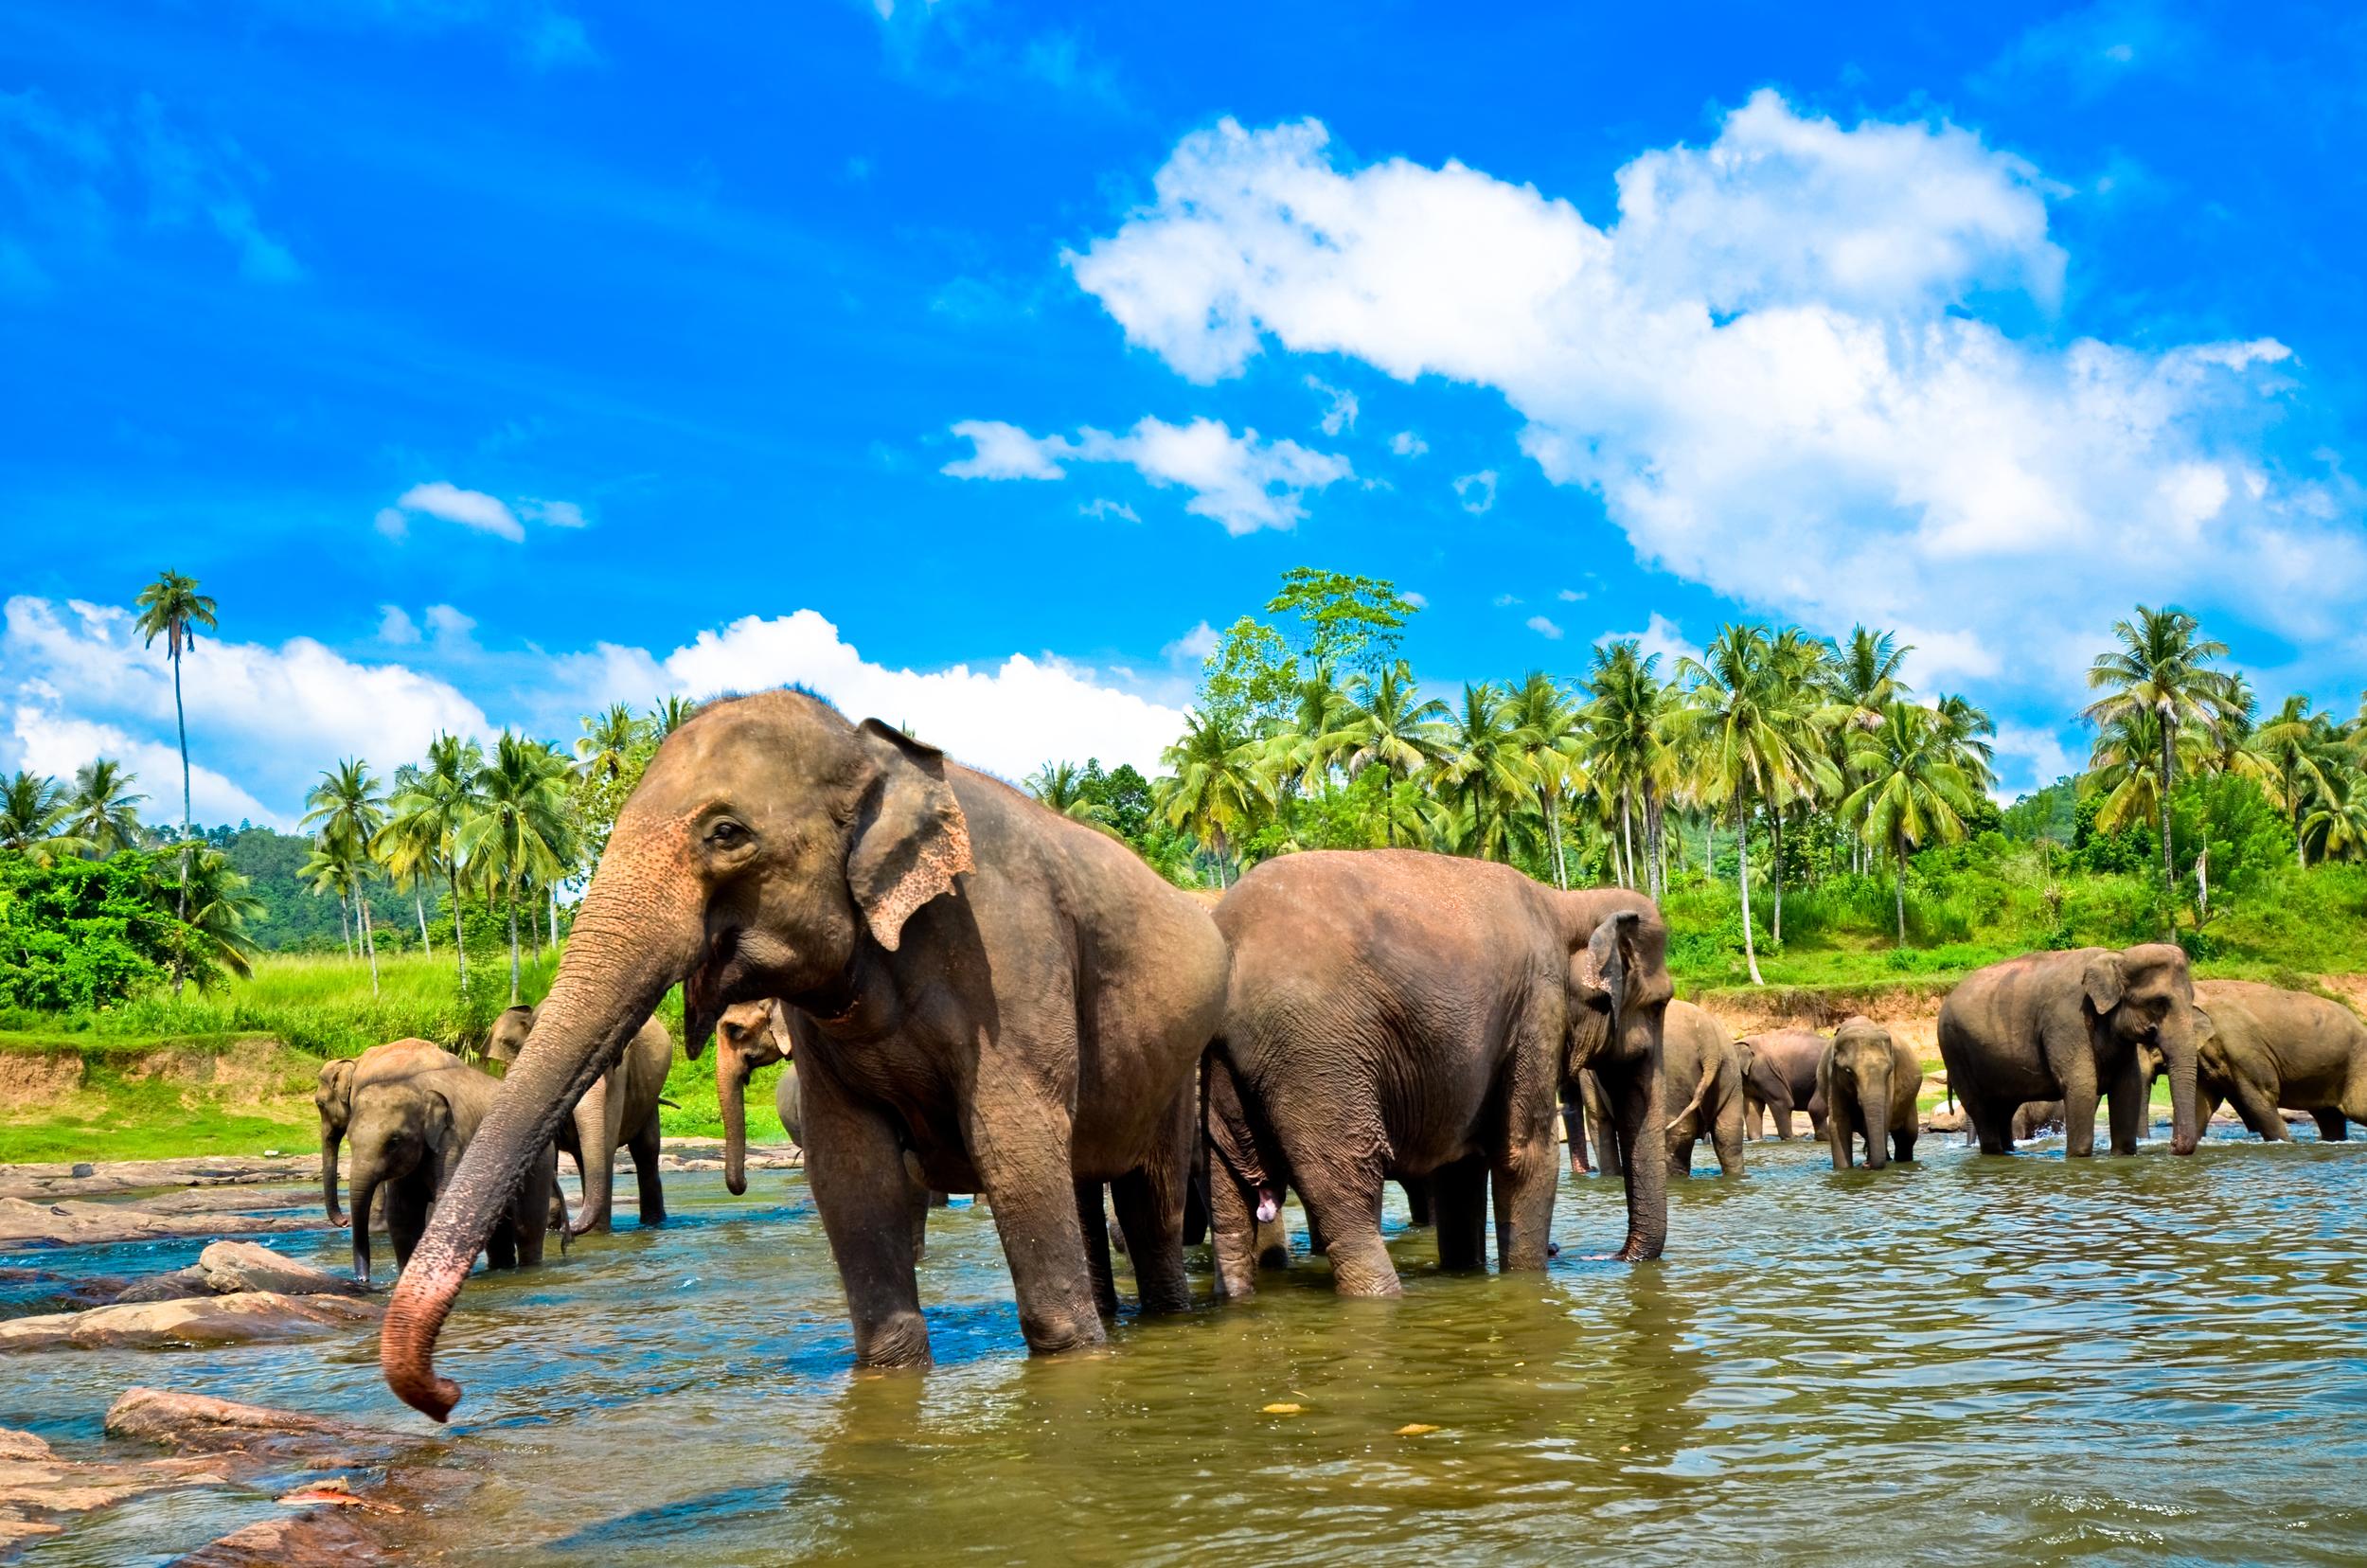 pinnawala-elephant-orphanage-sri-lanka-invite-to-paradise-river-3.jpg